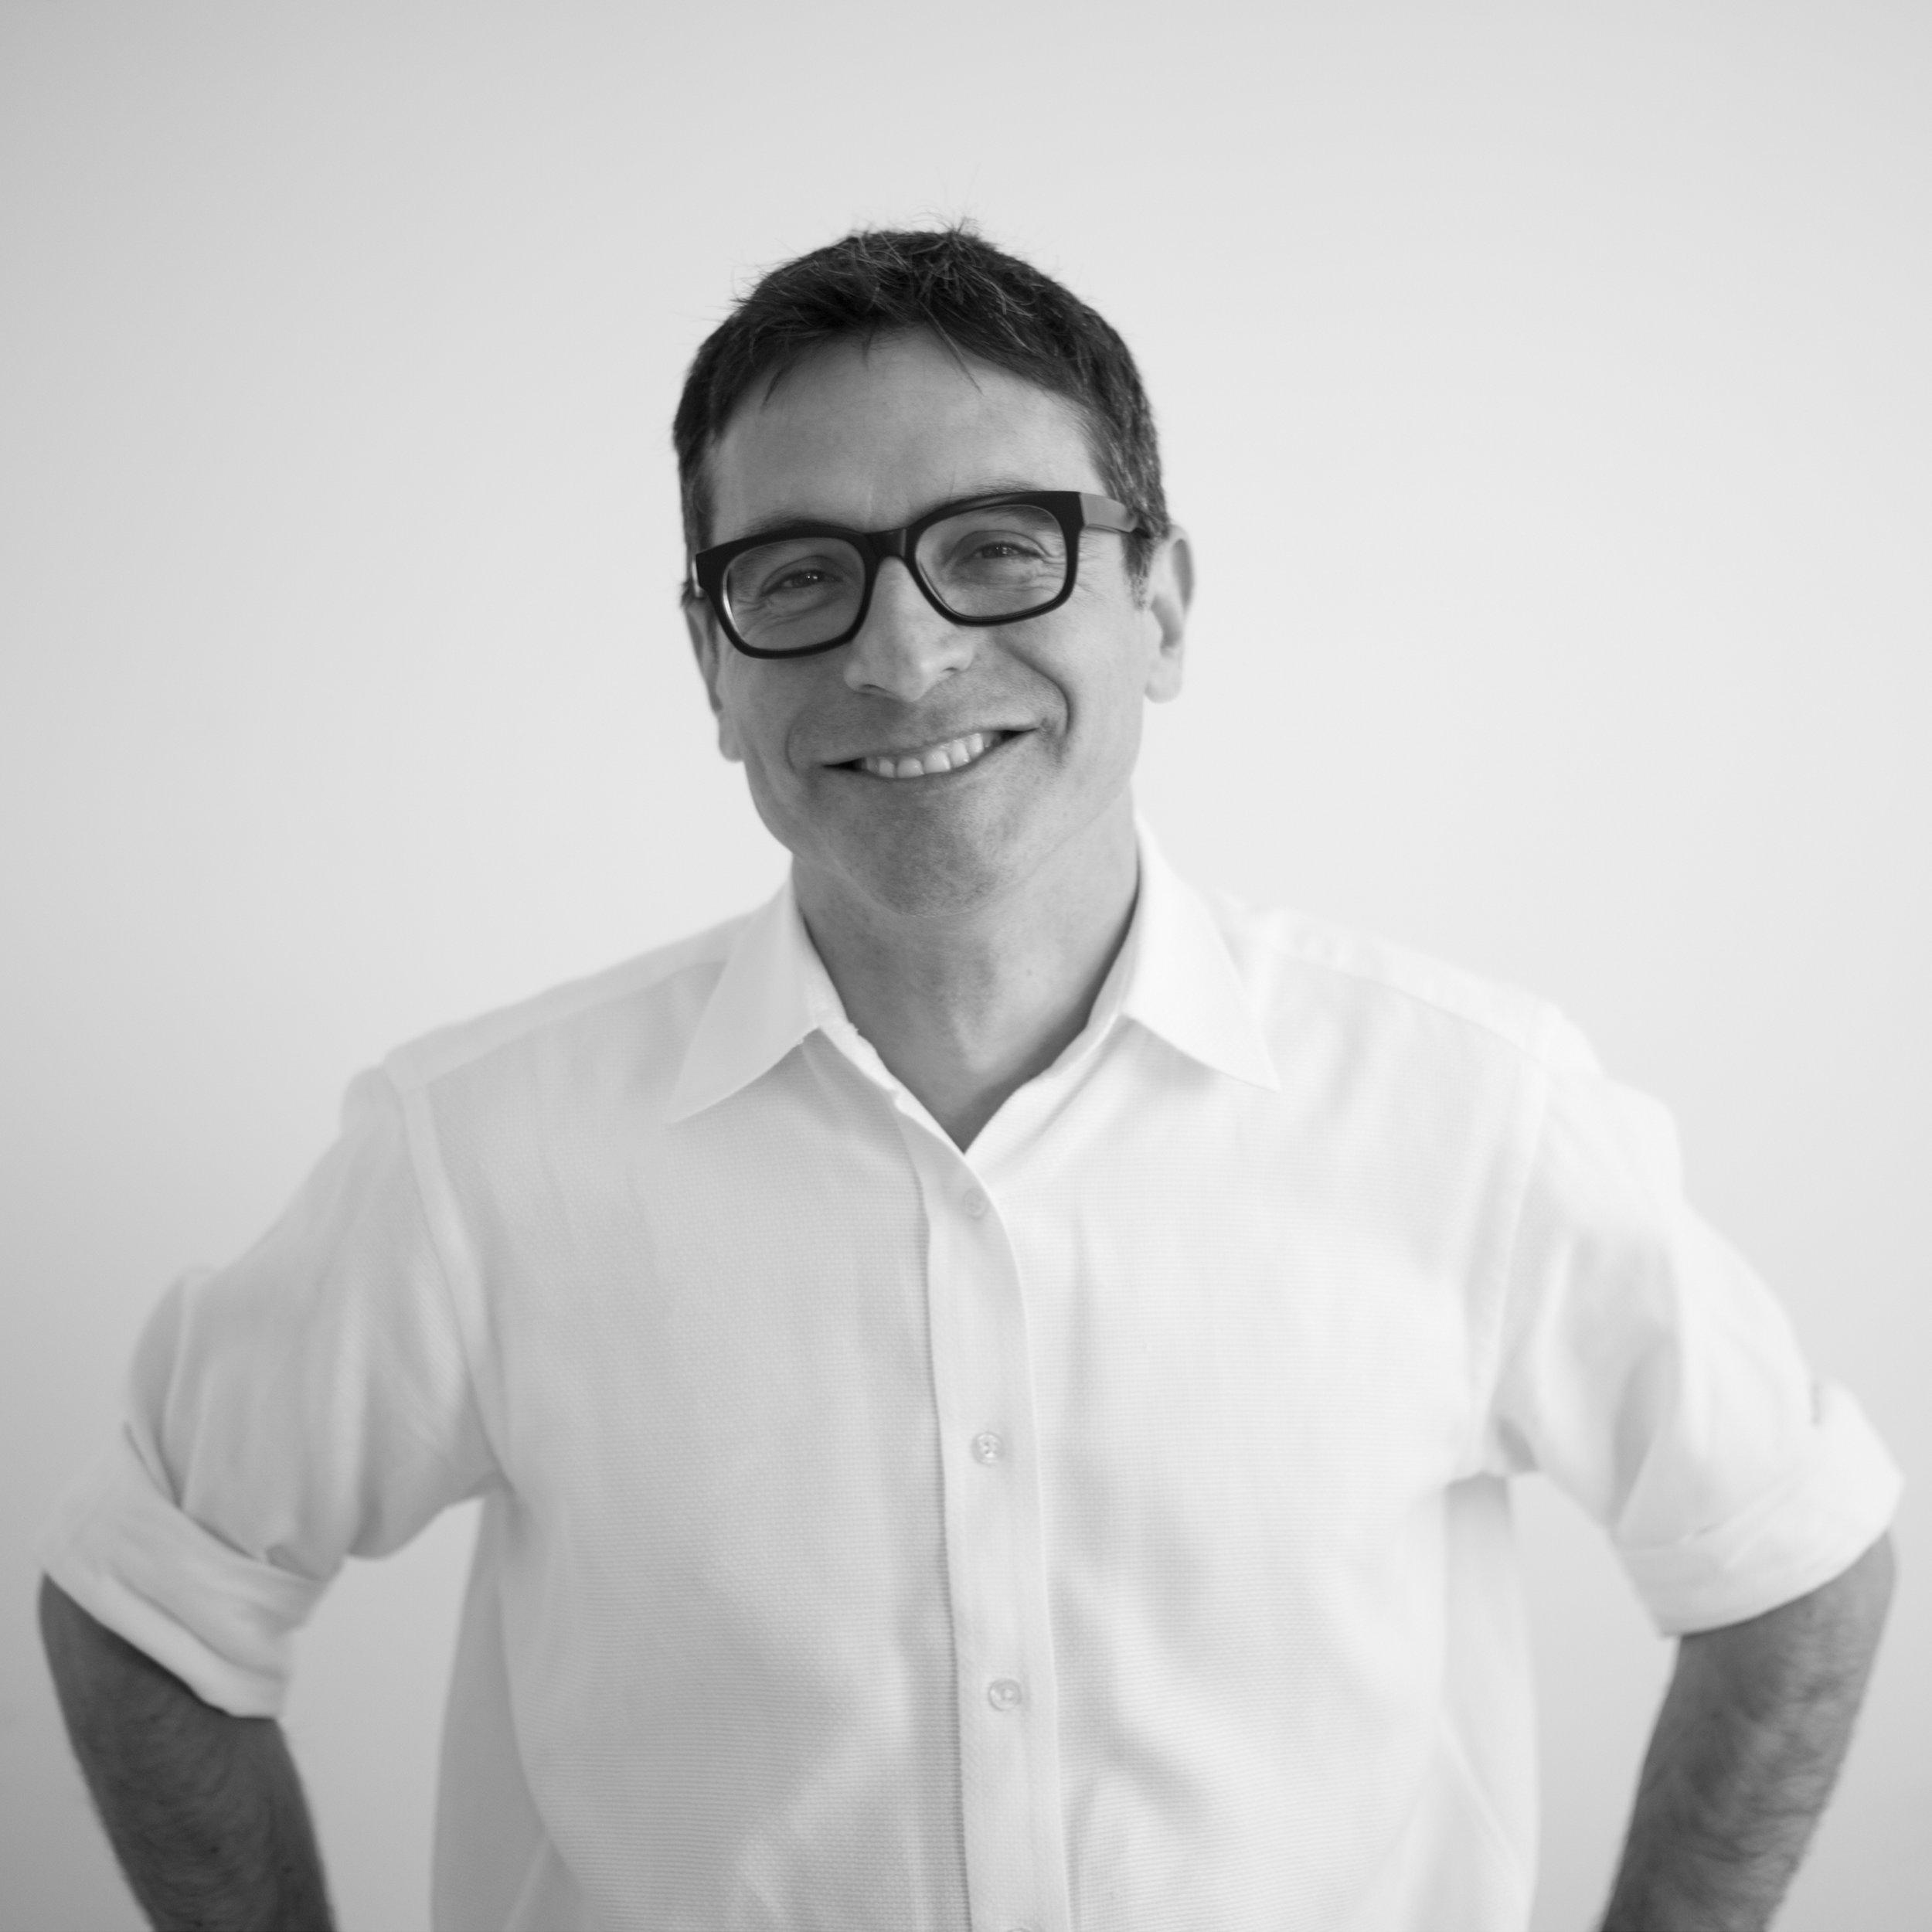 "<a href=""https://www.linkedin.com/in/phillipbensaid""><b>Phillip Bensaid</b><br/><sml>Founder, Partner</sml></a>"